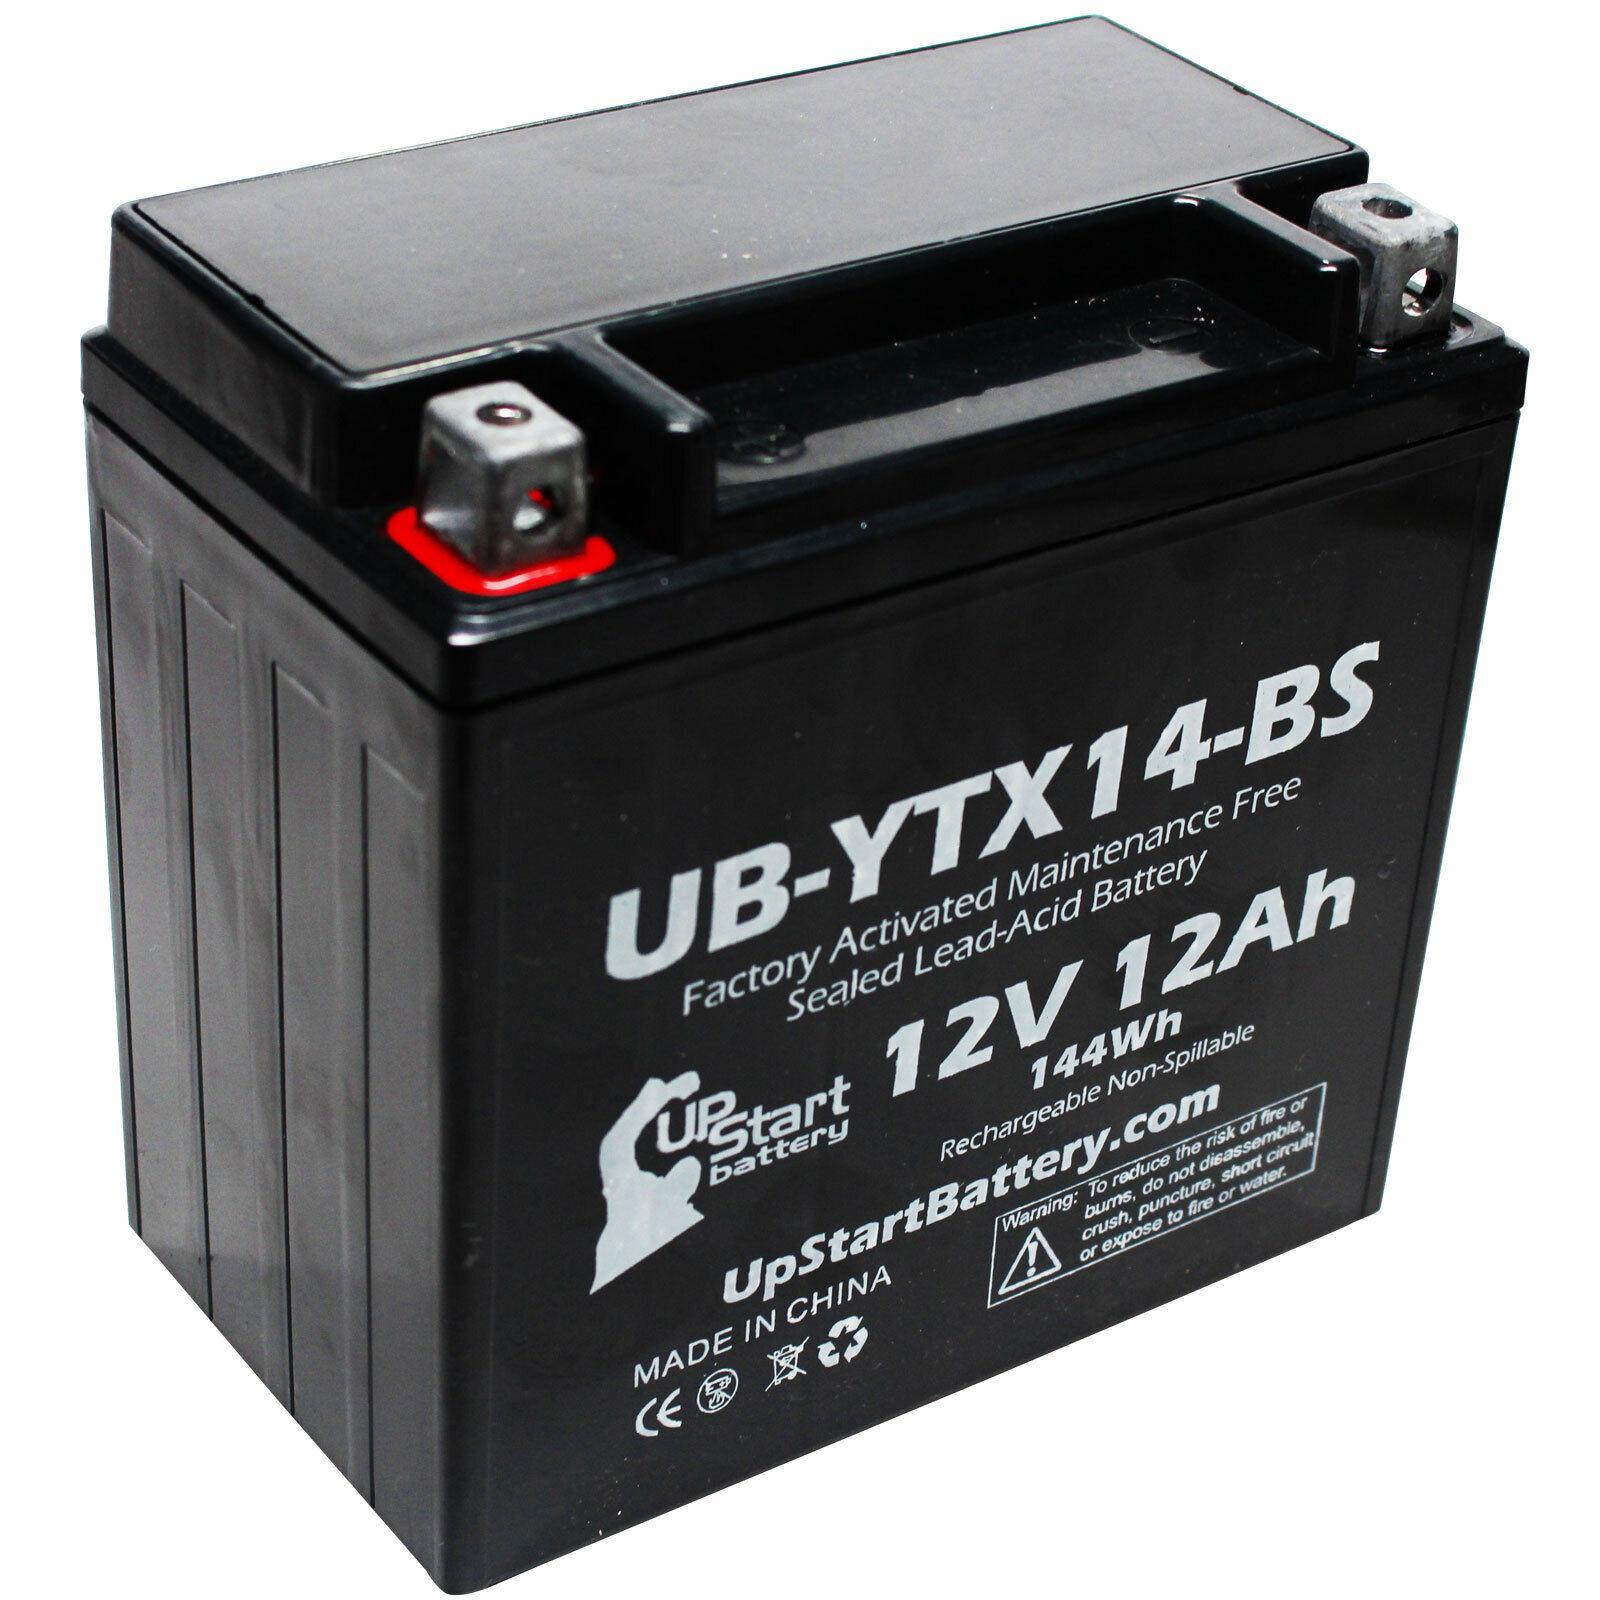 12V 12AH Battery for 1989 Honda TRX350, D FourTrax 4x4 350 CC